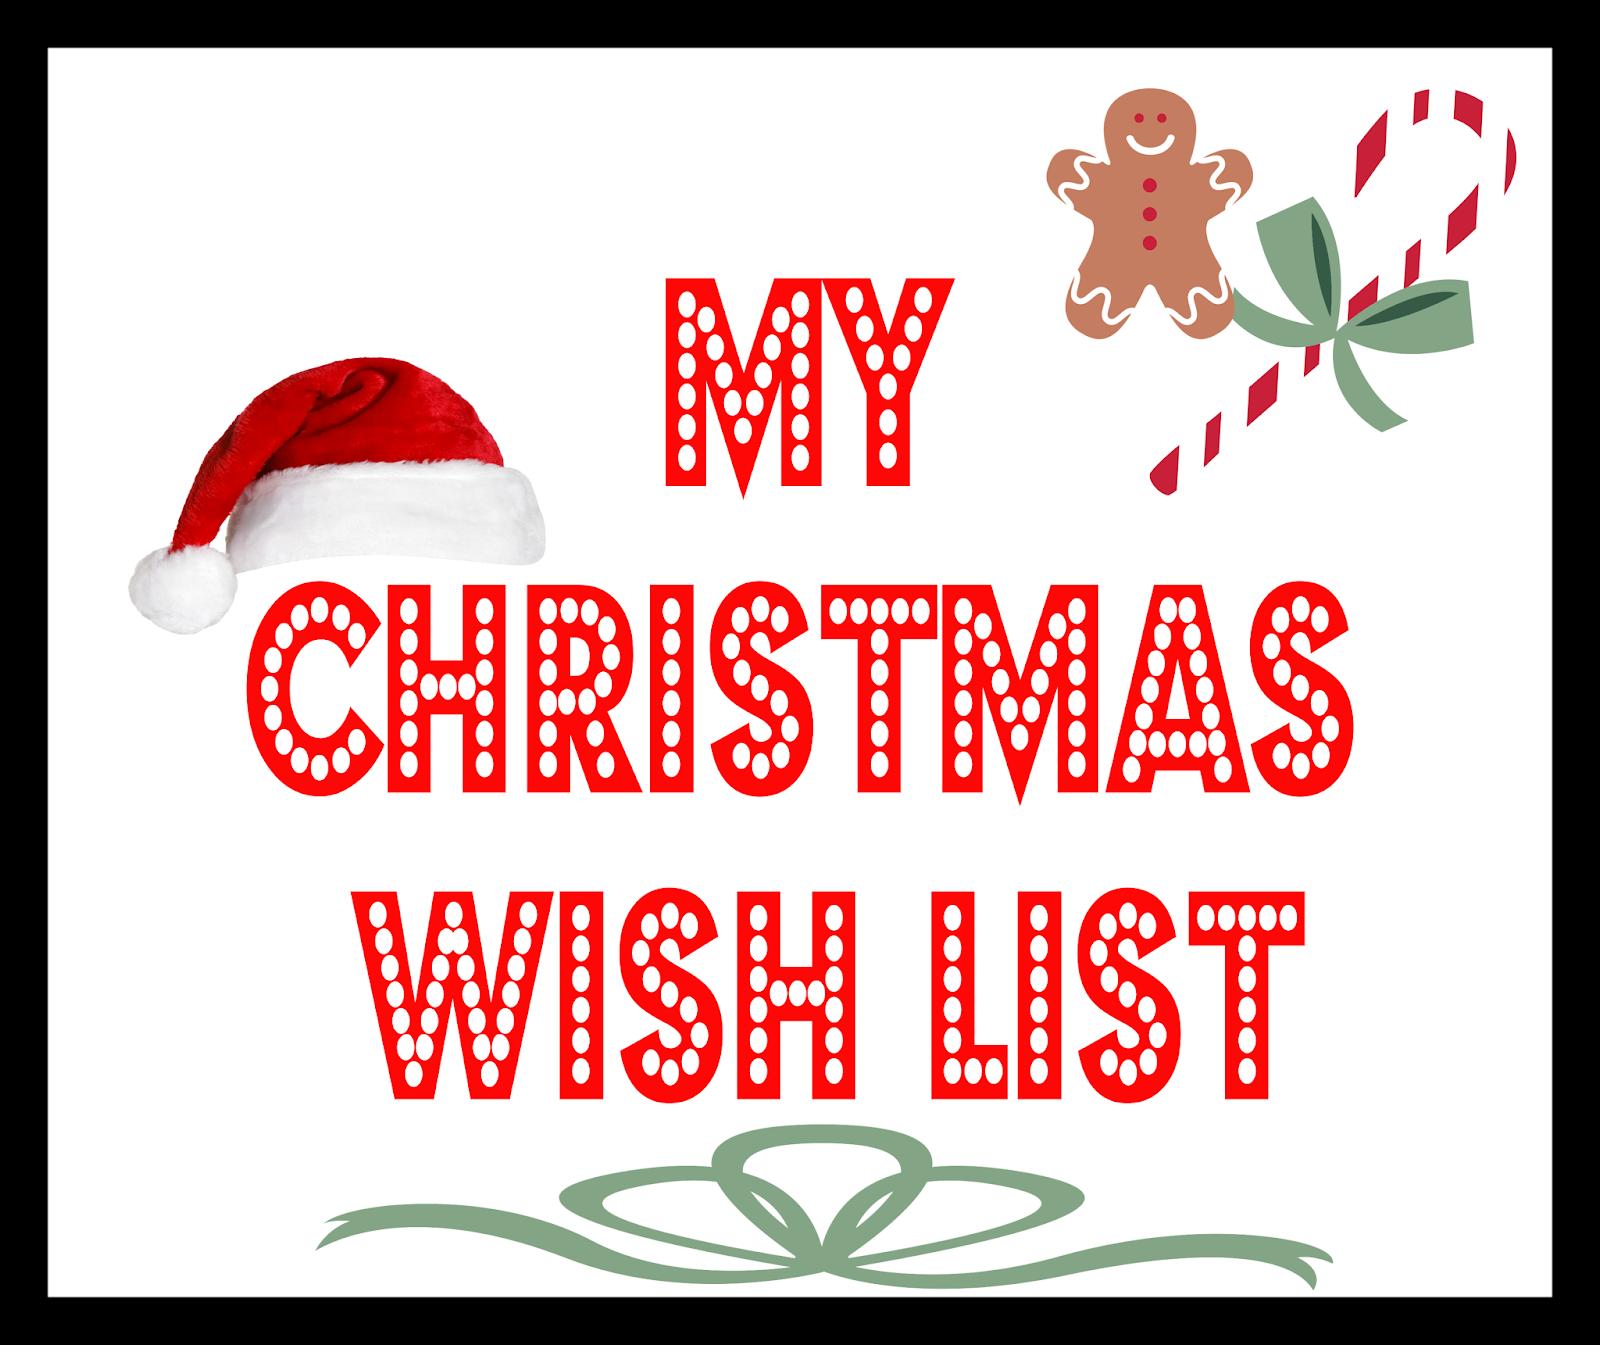 My Christmas Wish List.My Christmas Wish List The Horton Family